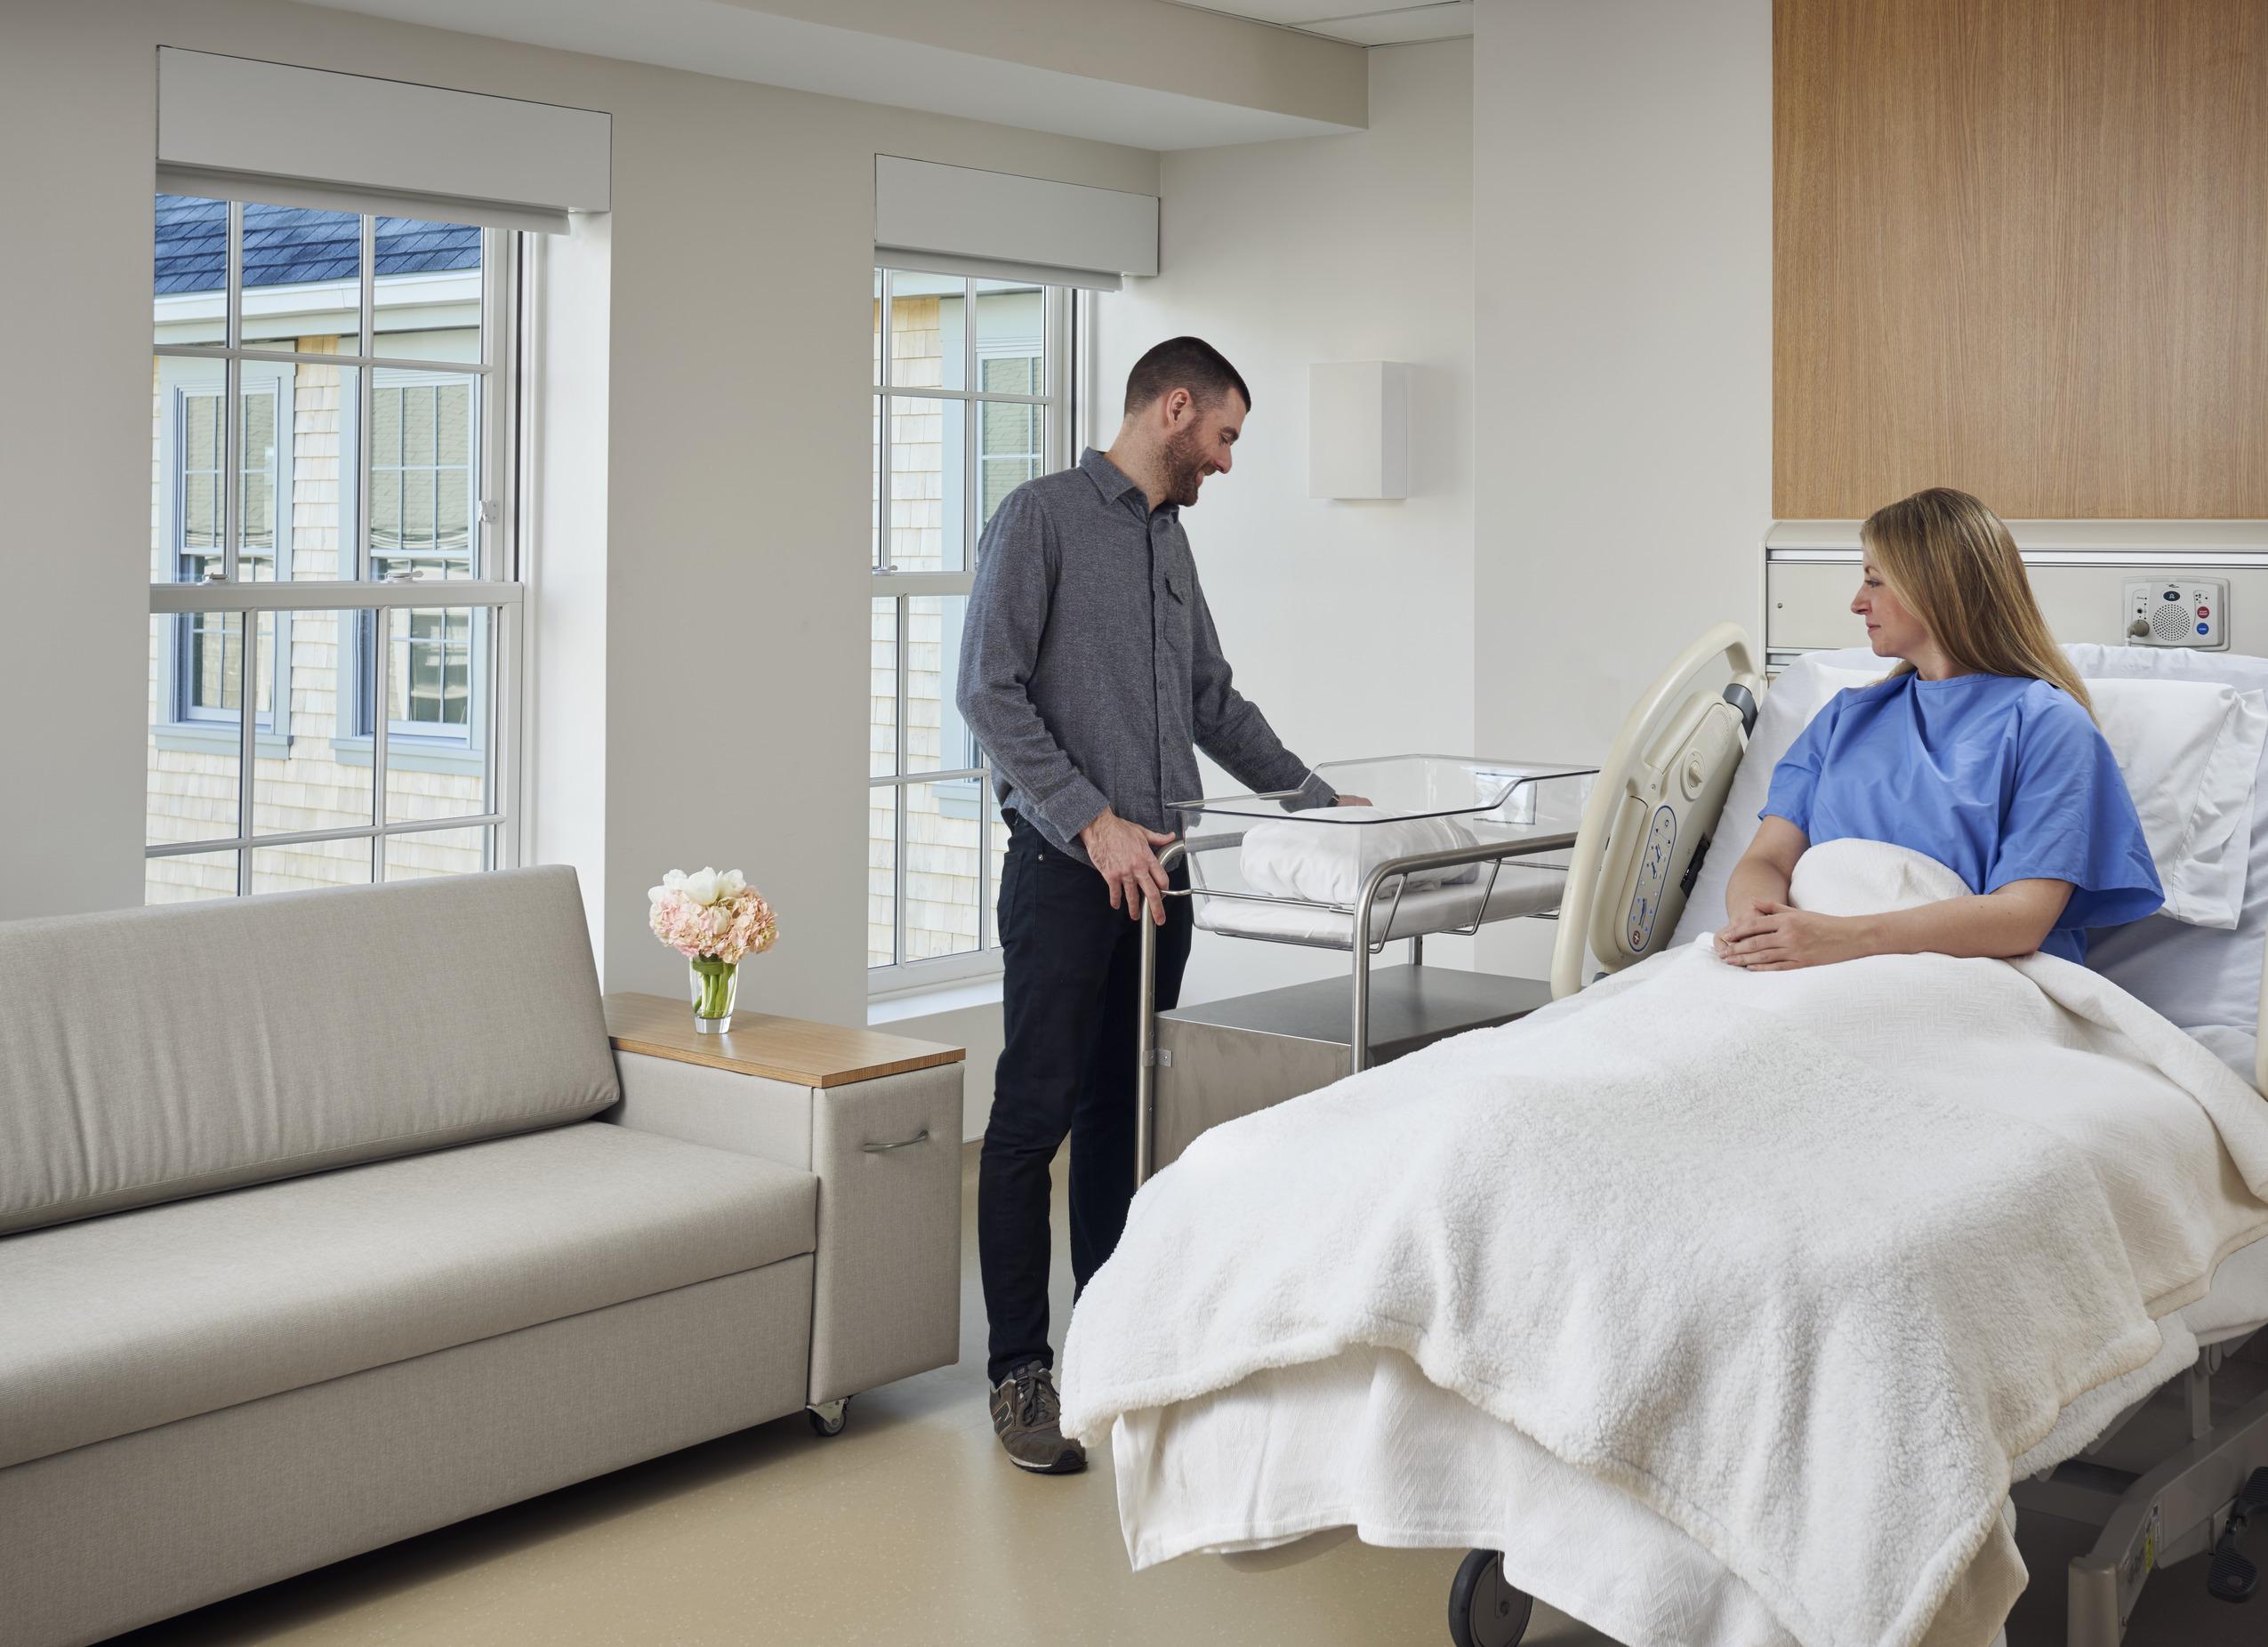 Fantastic Birthplace Nantucket Cottage Hospital Cjindustries Chair Design For Home Cjindustriesco